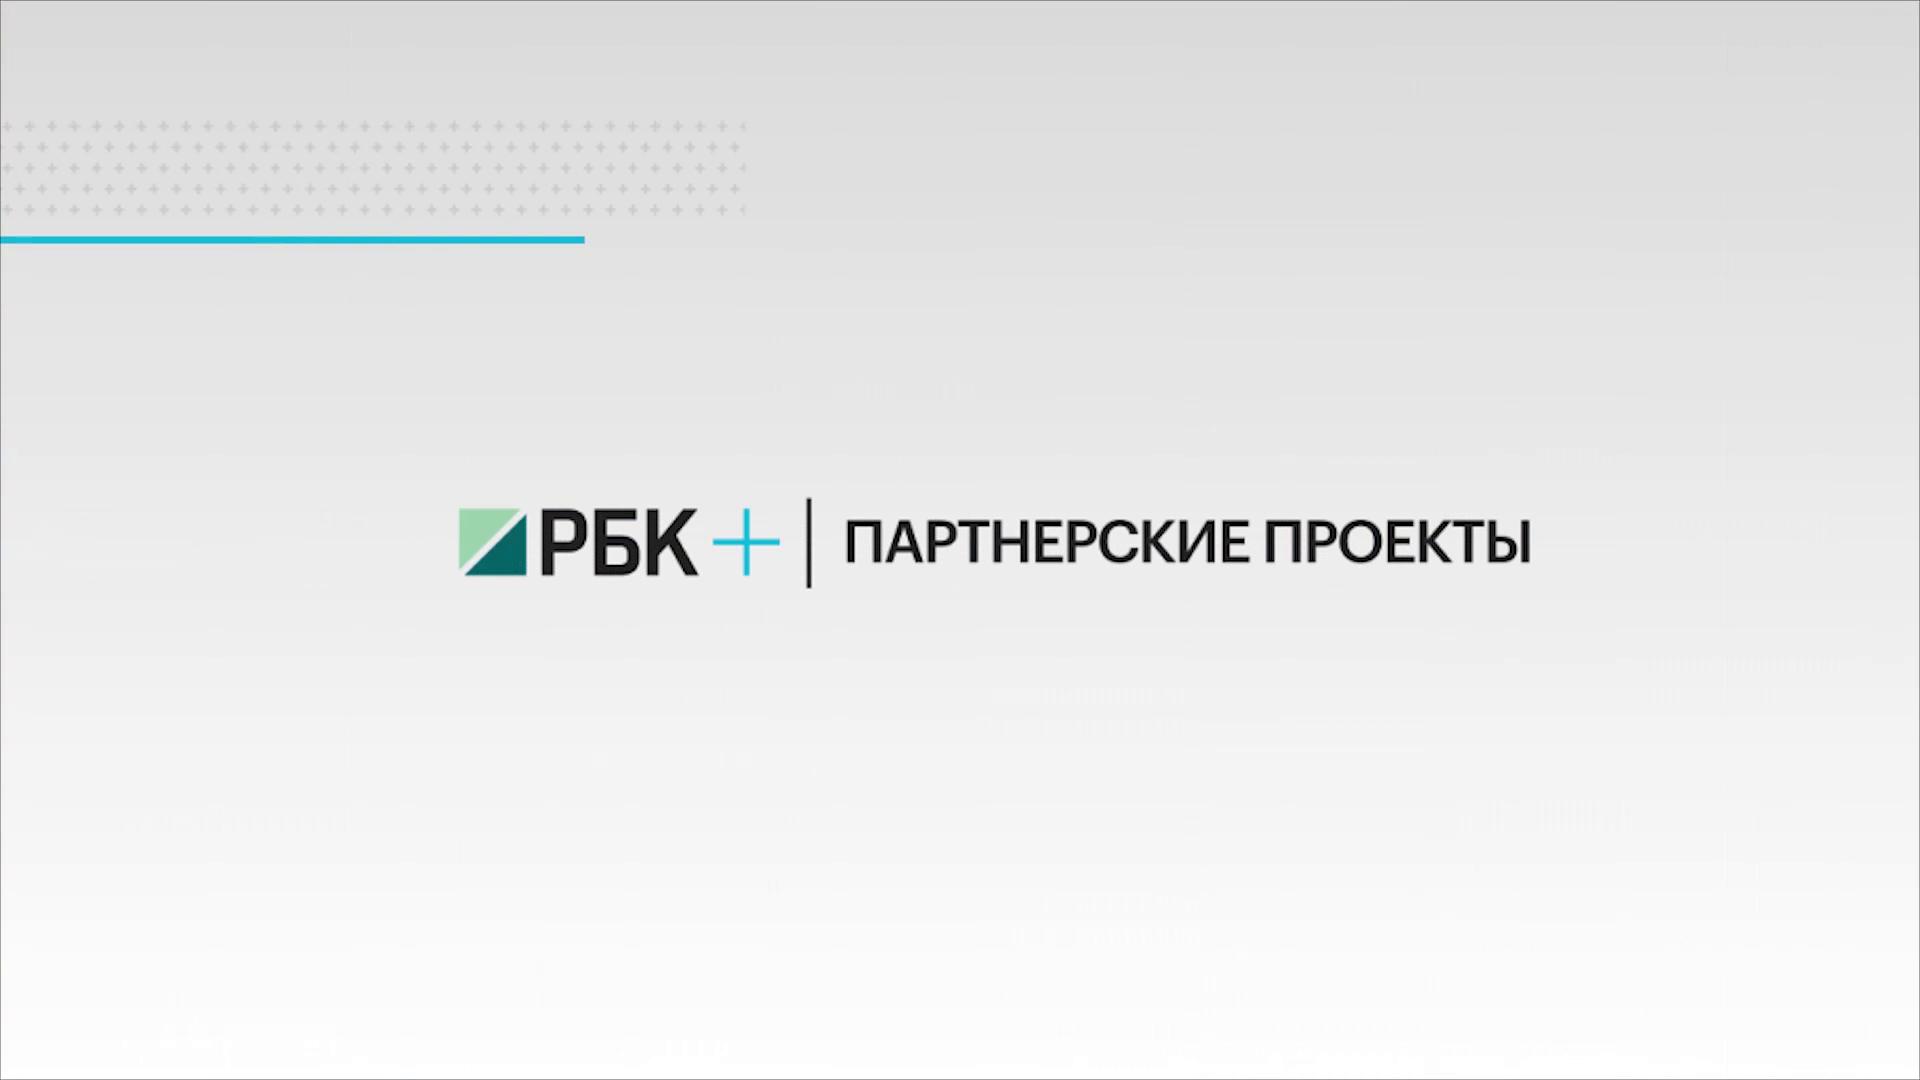 Programme: РБК+ / Бизнес-манифест